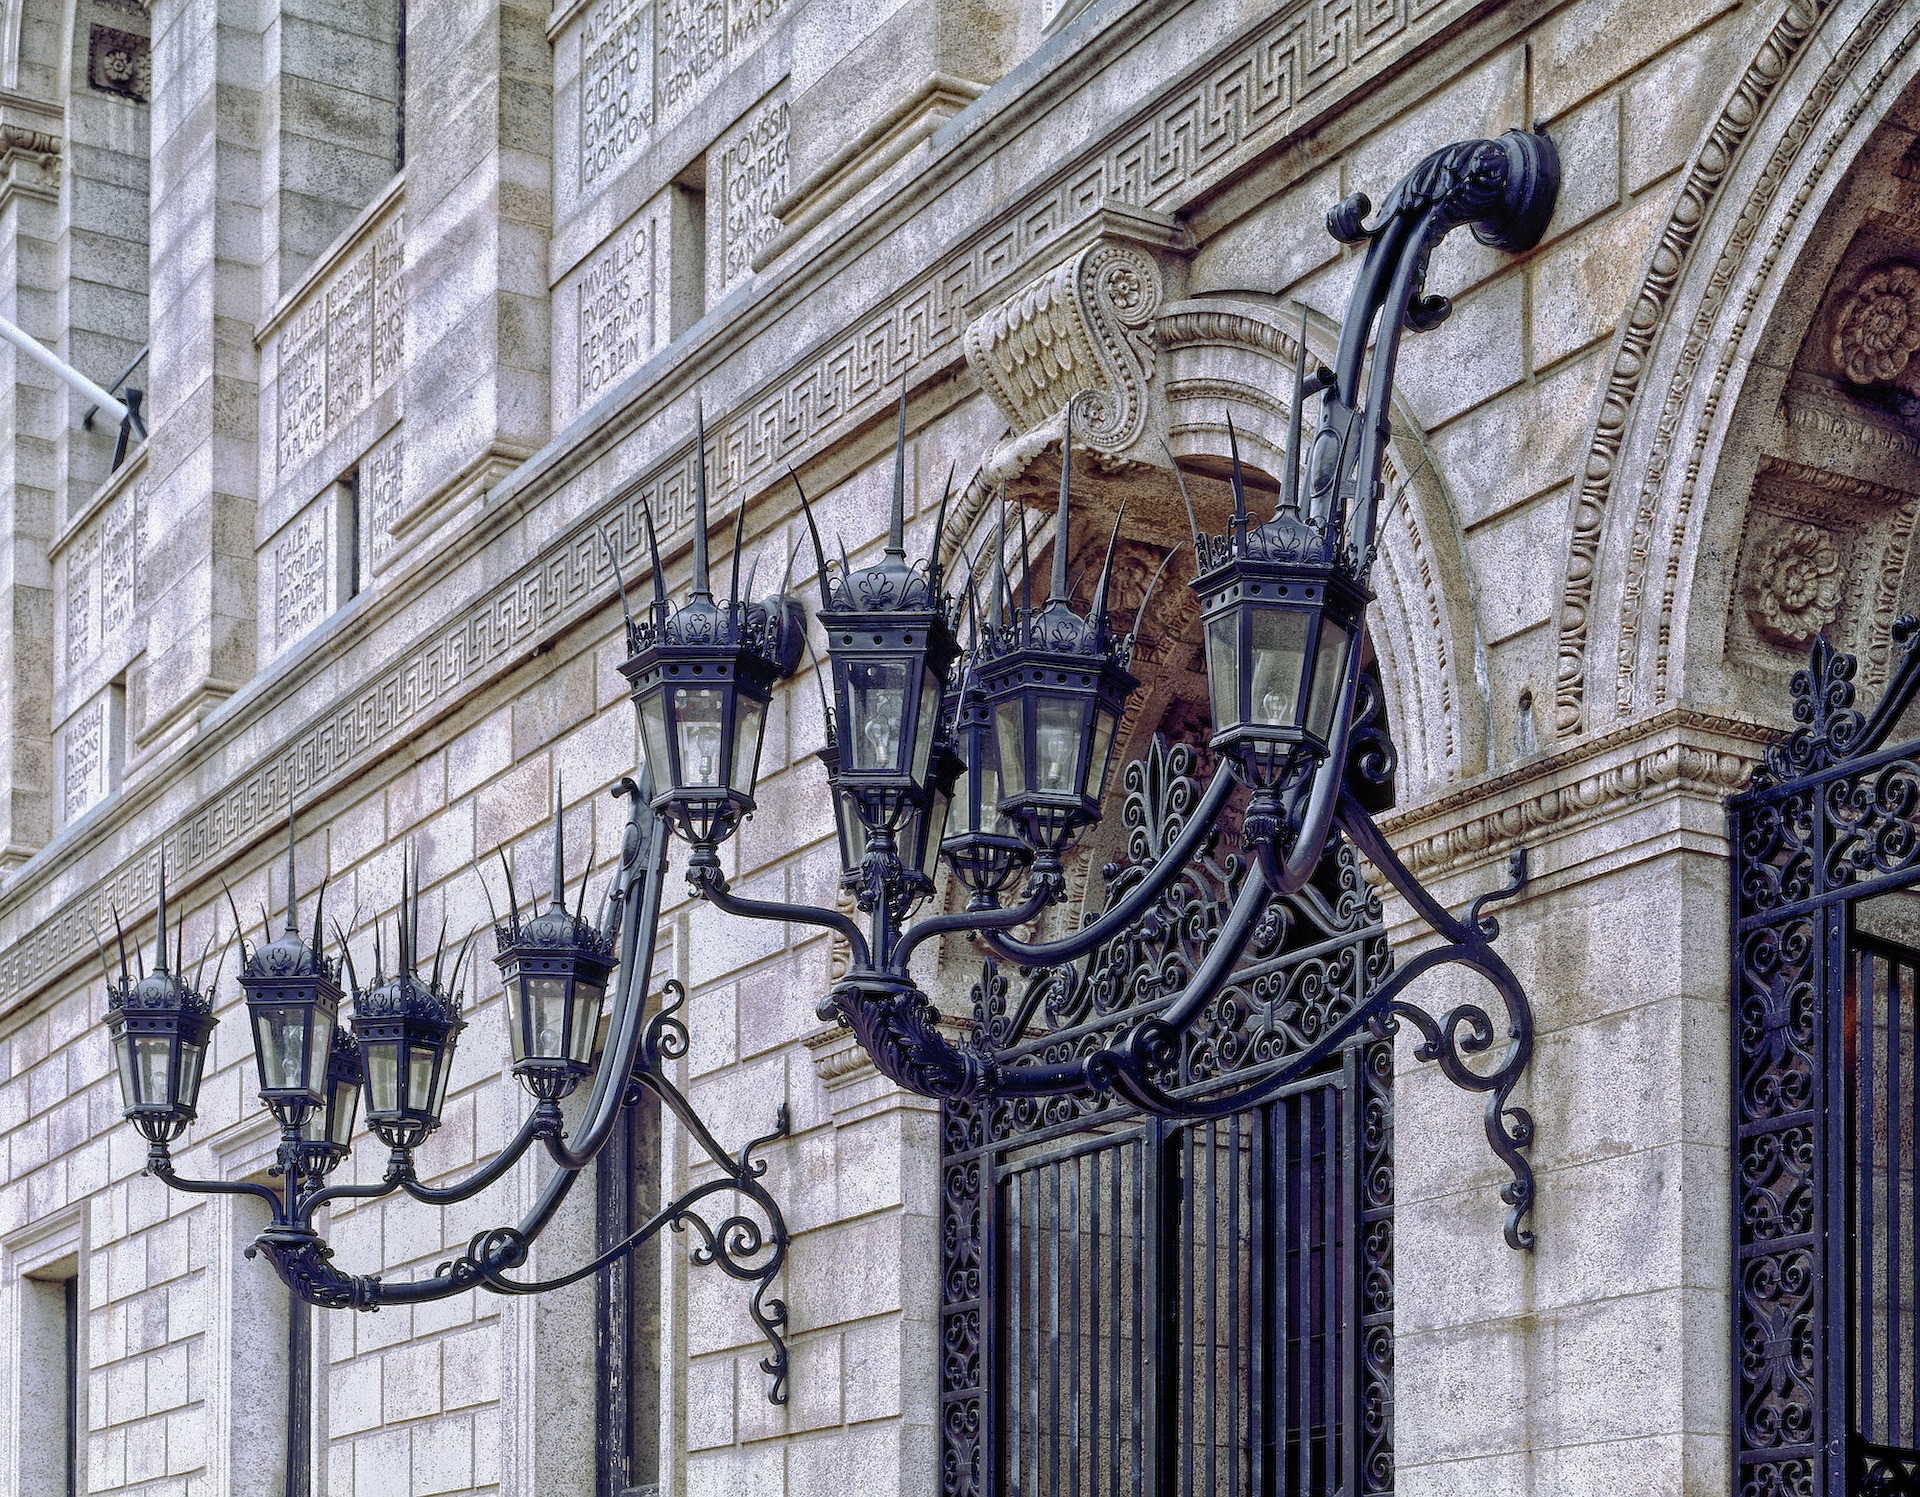 Fachada da public library - biblioteca pública - de Boston